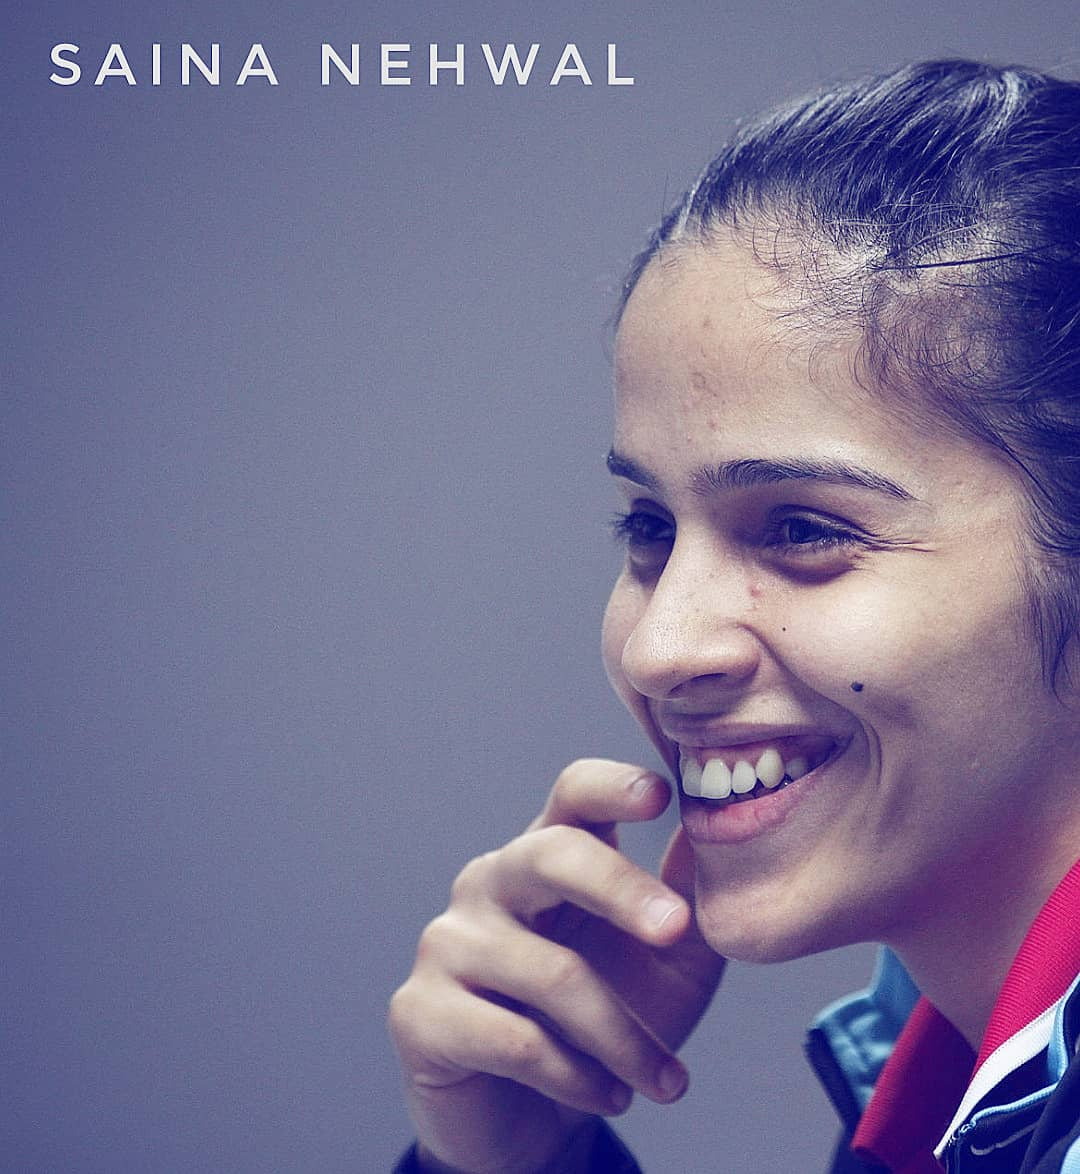 RT @AnkitShivam24: #sainanehwal @NSaina Queen Forever 💝💝 #badminton https://t.co/O7vSEXN7zZ